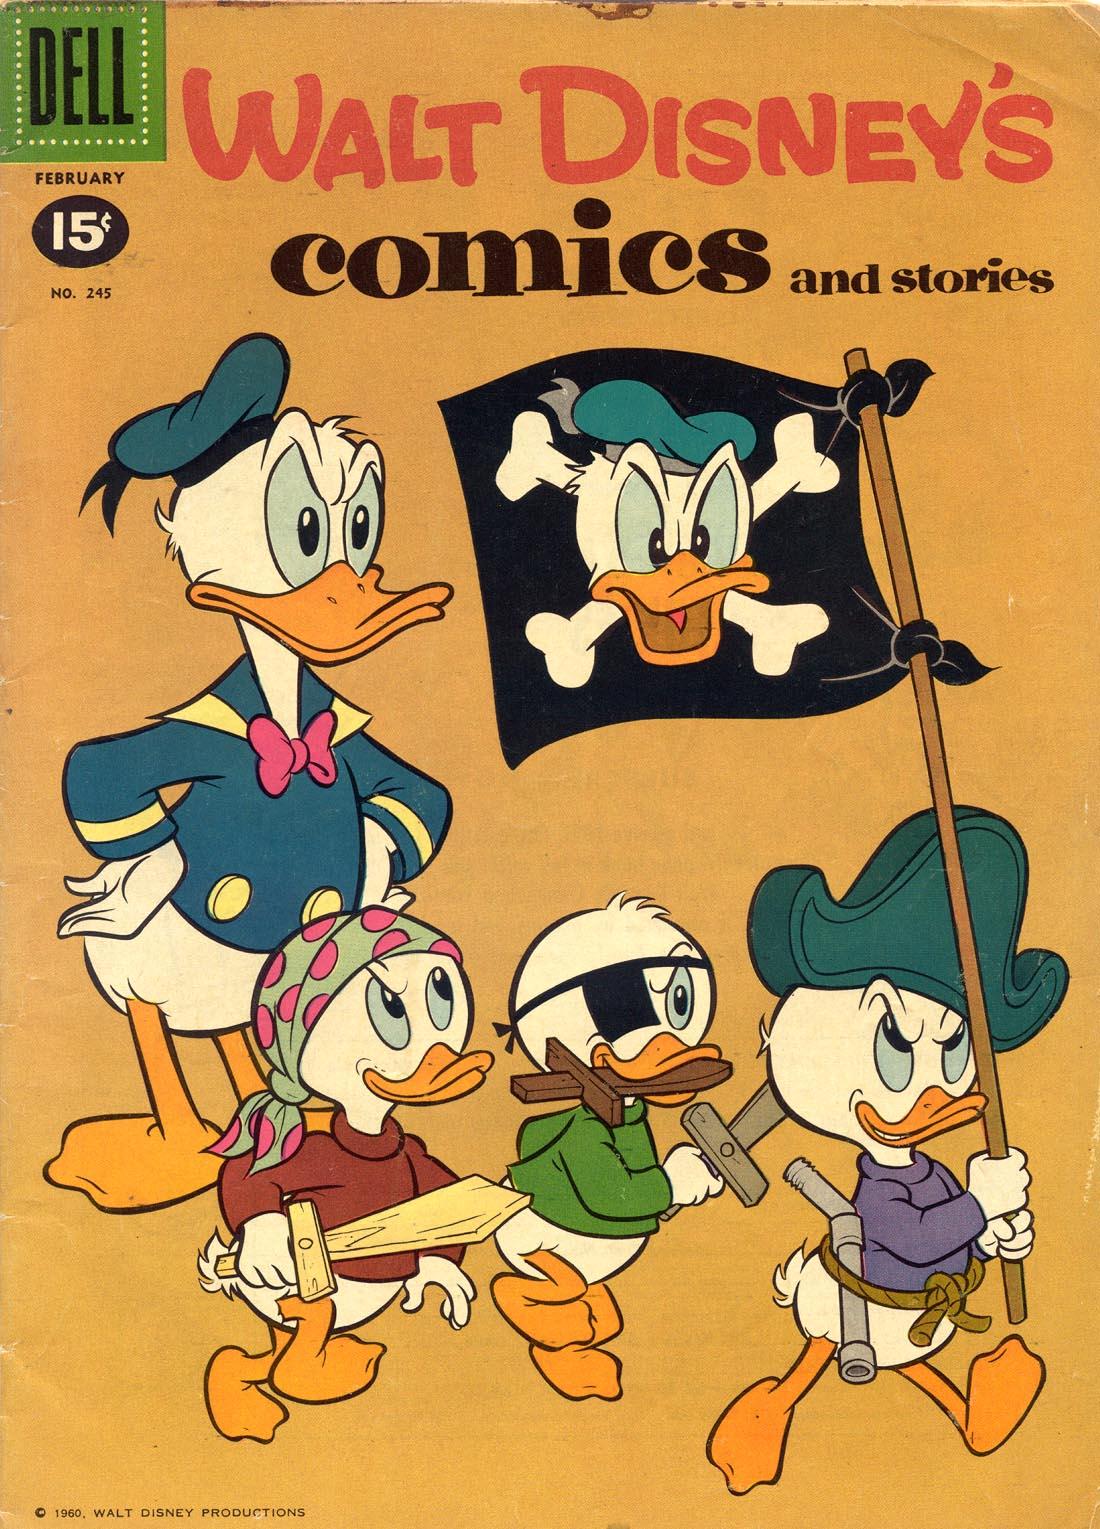 Walt Disneys Comics and Stories 245 Page 1